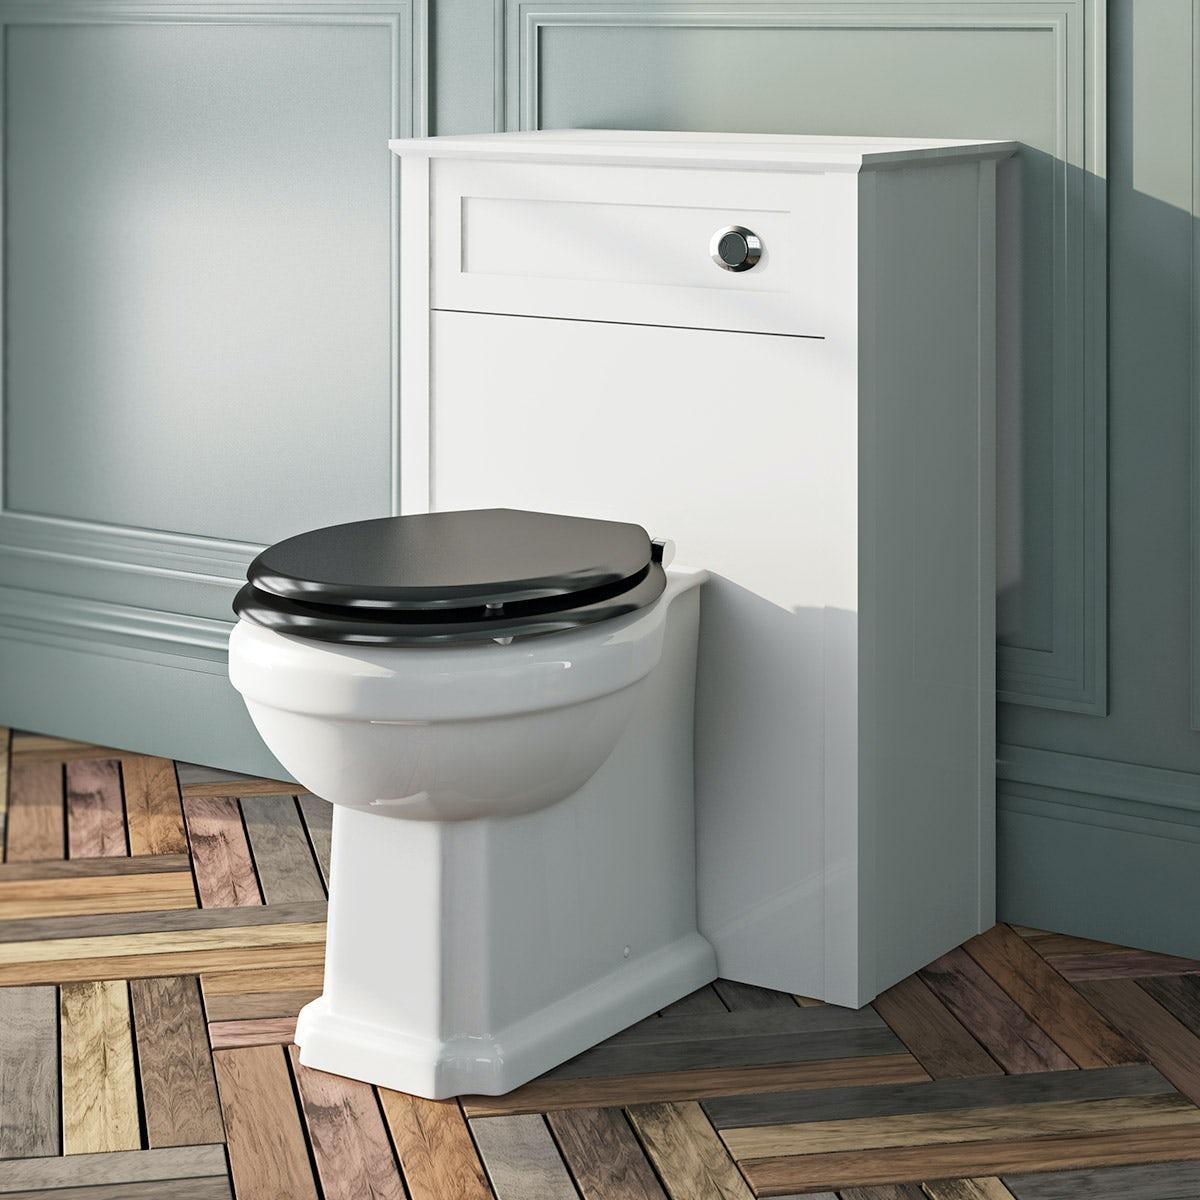 Crane Toilet Flapper Replacement. Amusing Crane Toilet Flapper Replacement Contemporary Plan 3D Interesting  Not Seating Ideas Best inspiration The 98 Home Decor